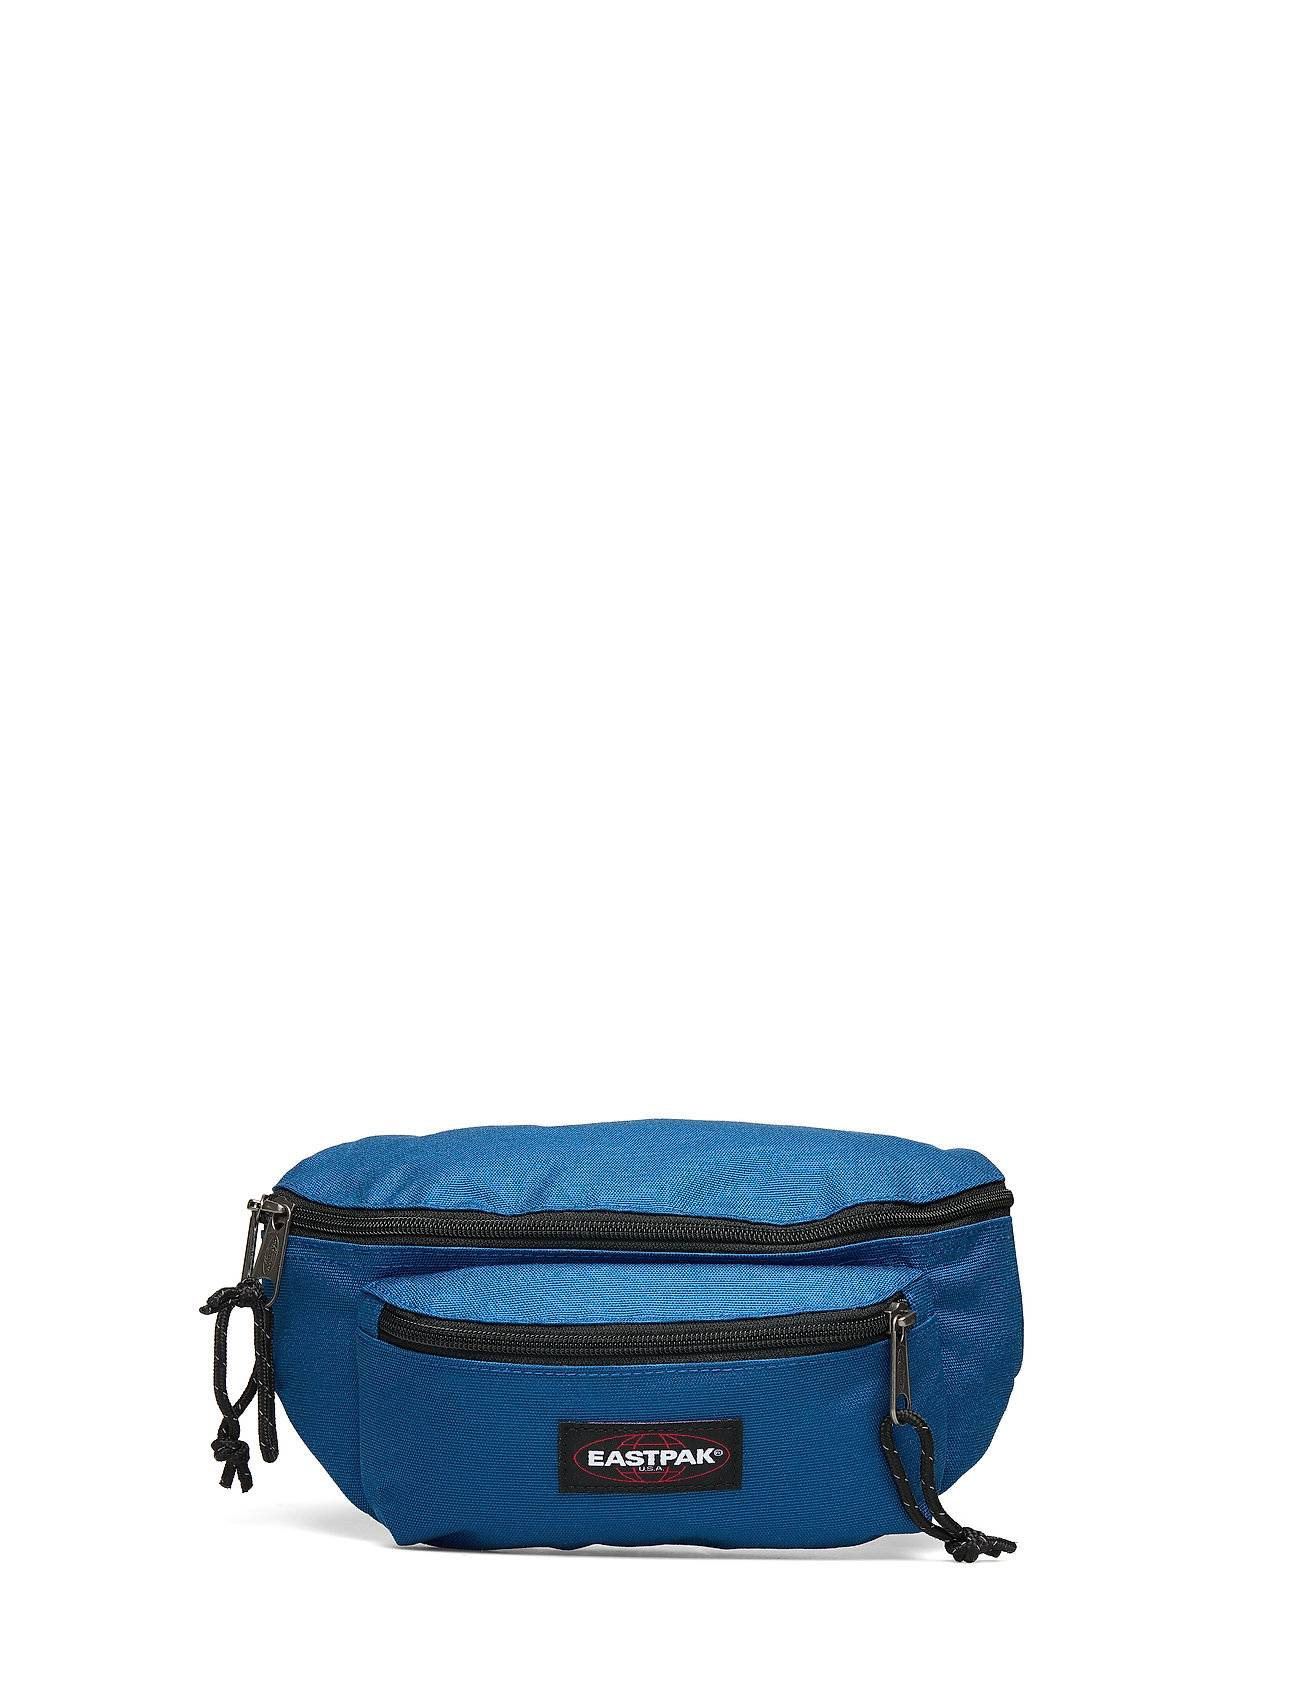 Eastpak Doggy Bag Bumbag Vyölaukku Laukku Sininen Eastpak